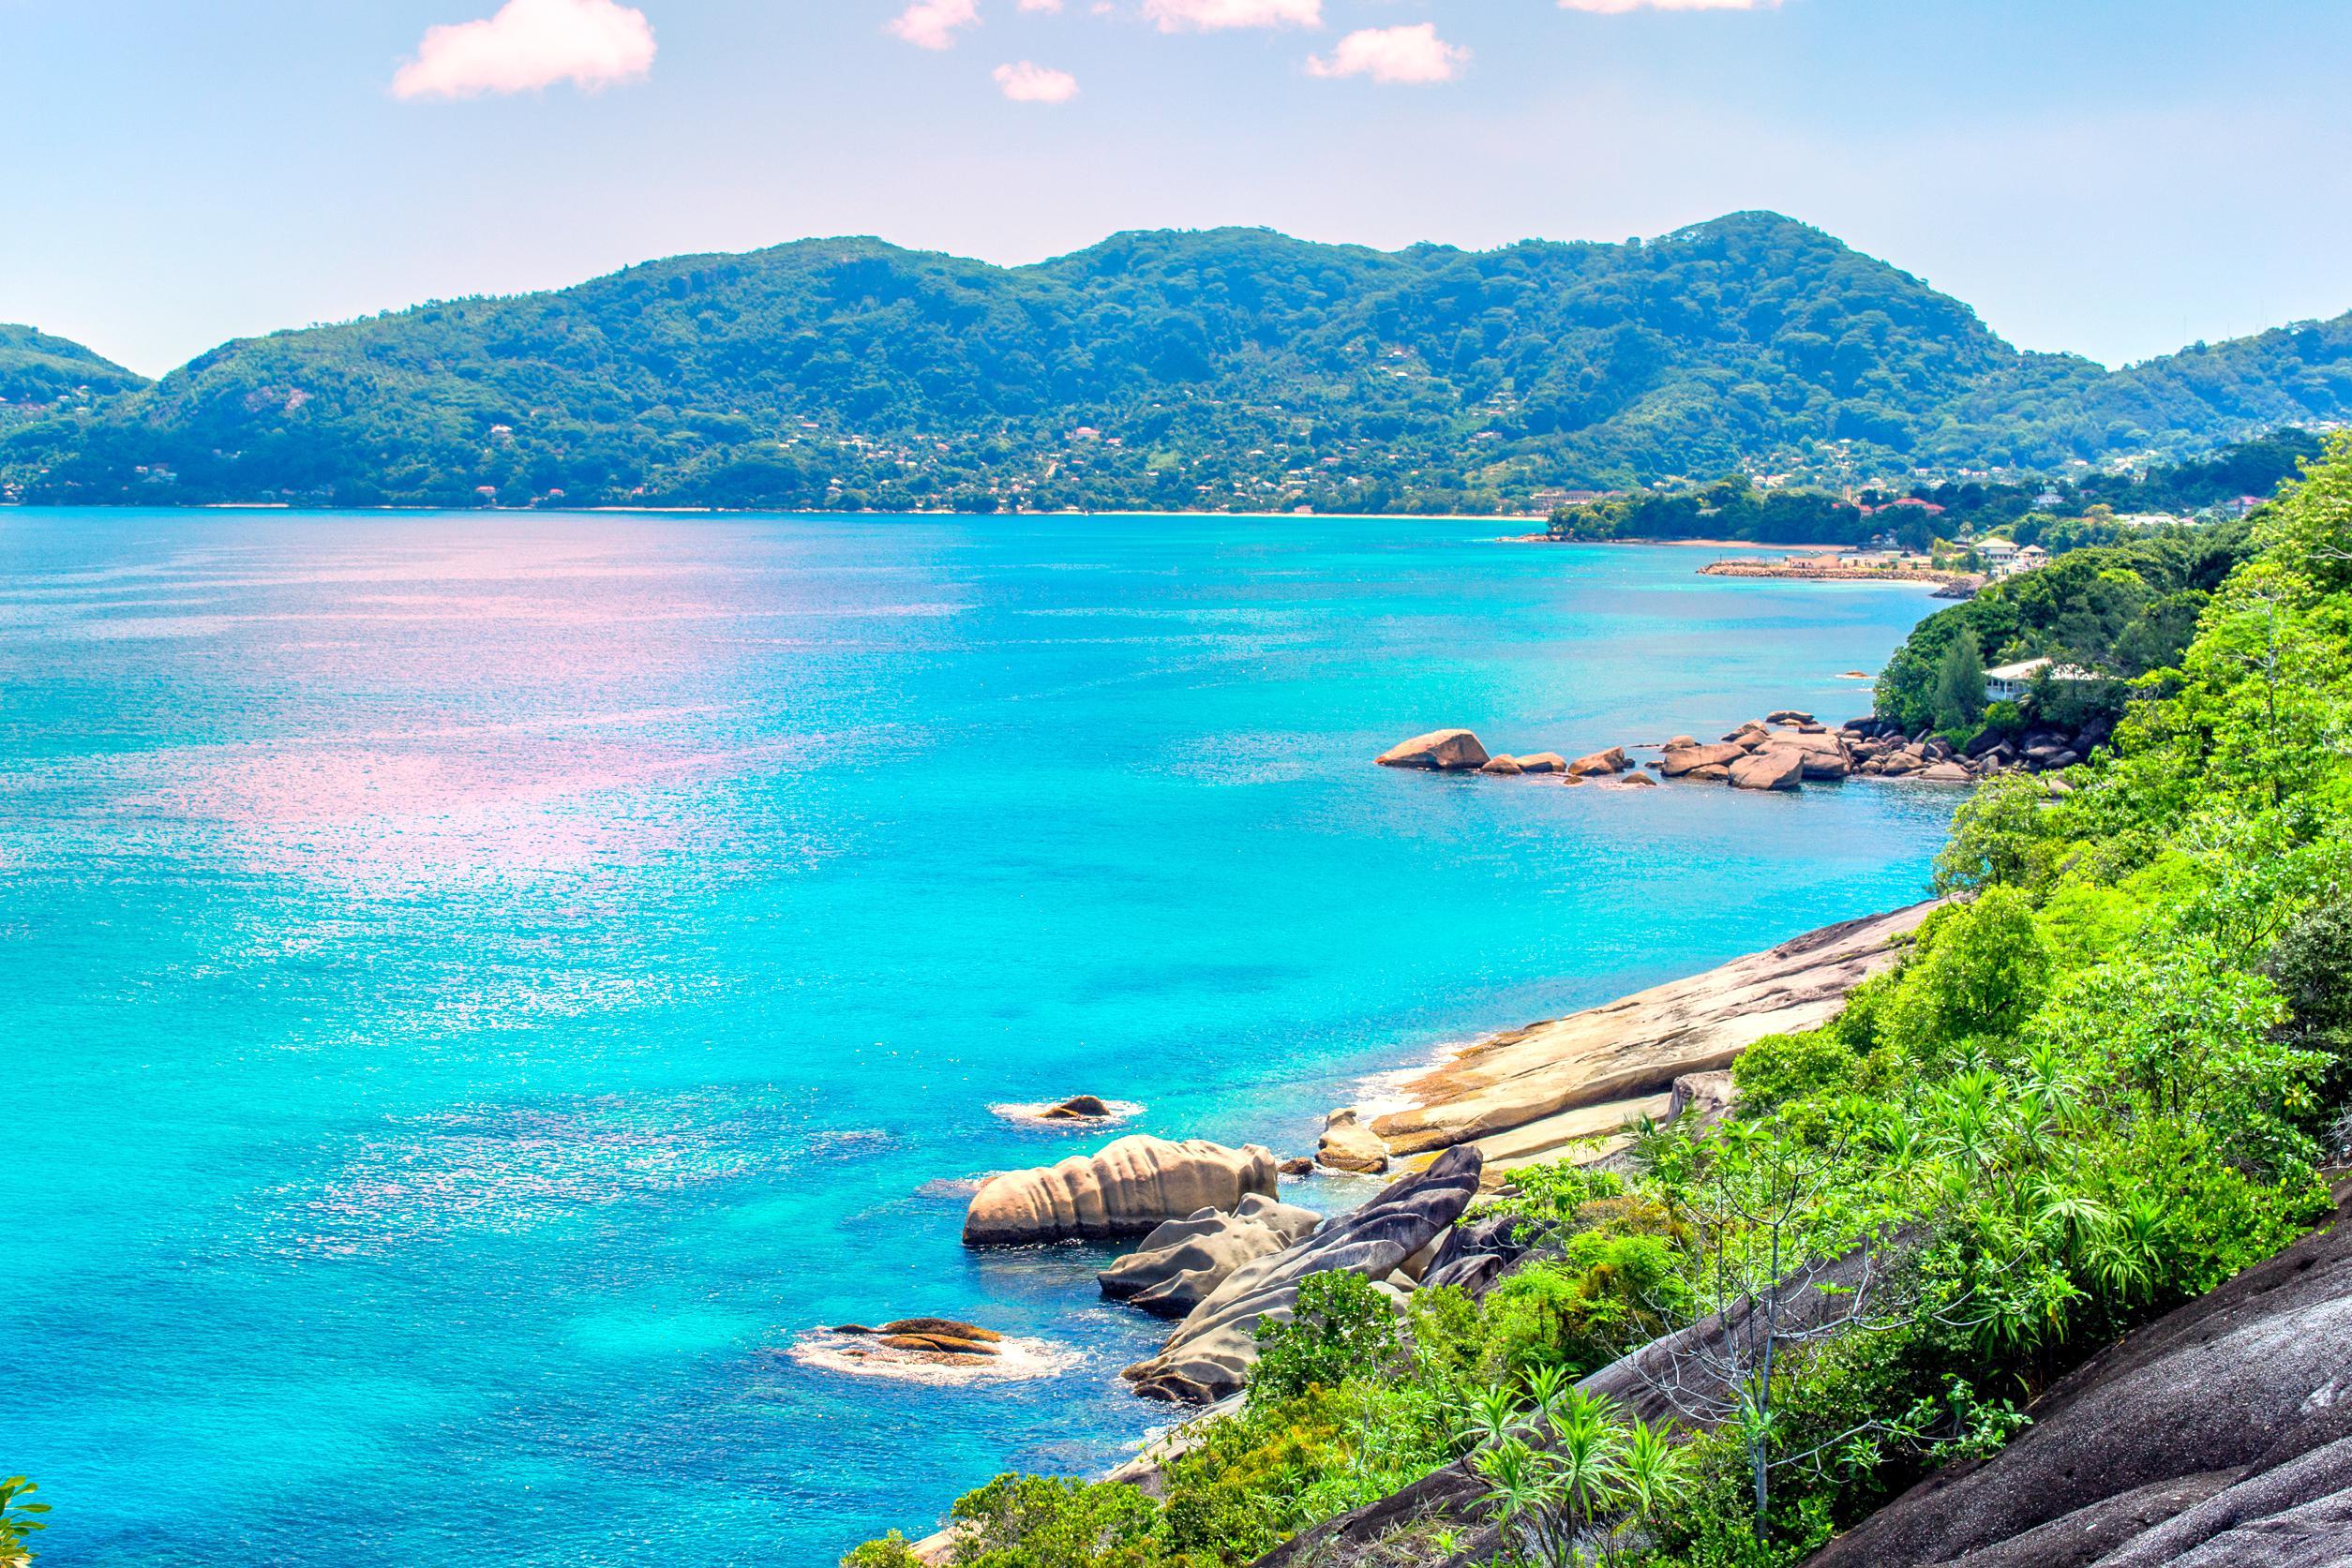 Morne Seychellois National Park